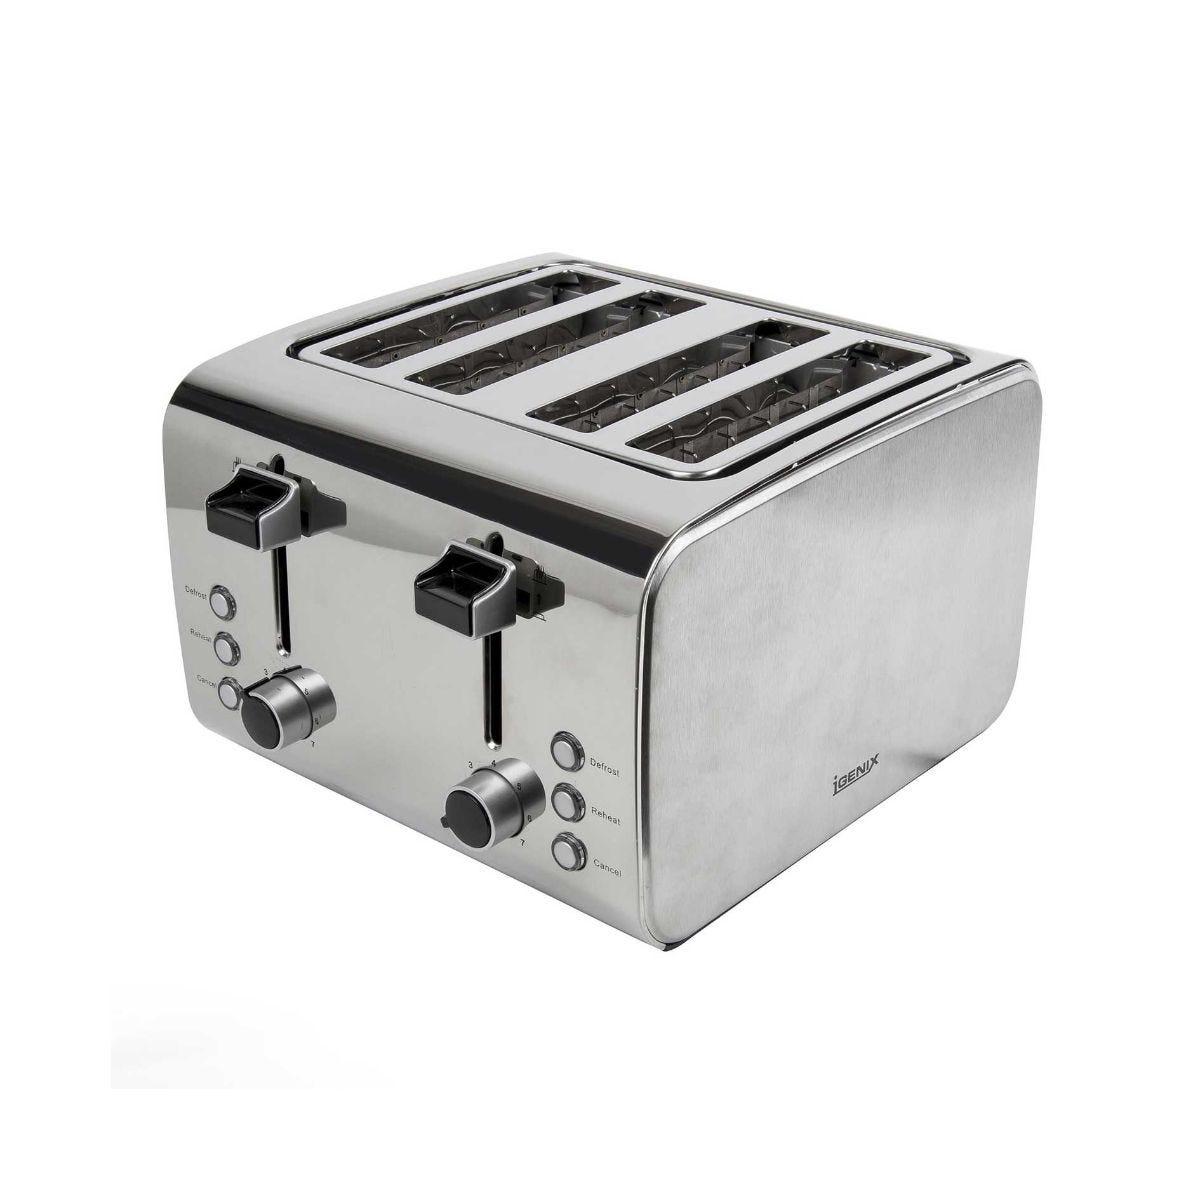 Igenix 4 Slice Toaster Stainless Steel Brush and Polish